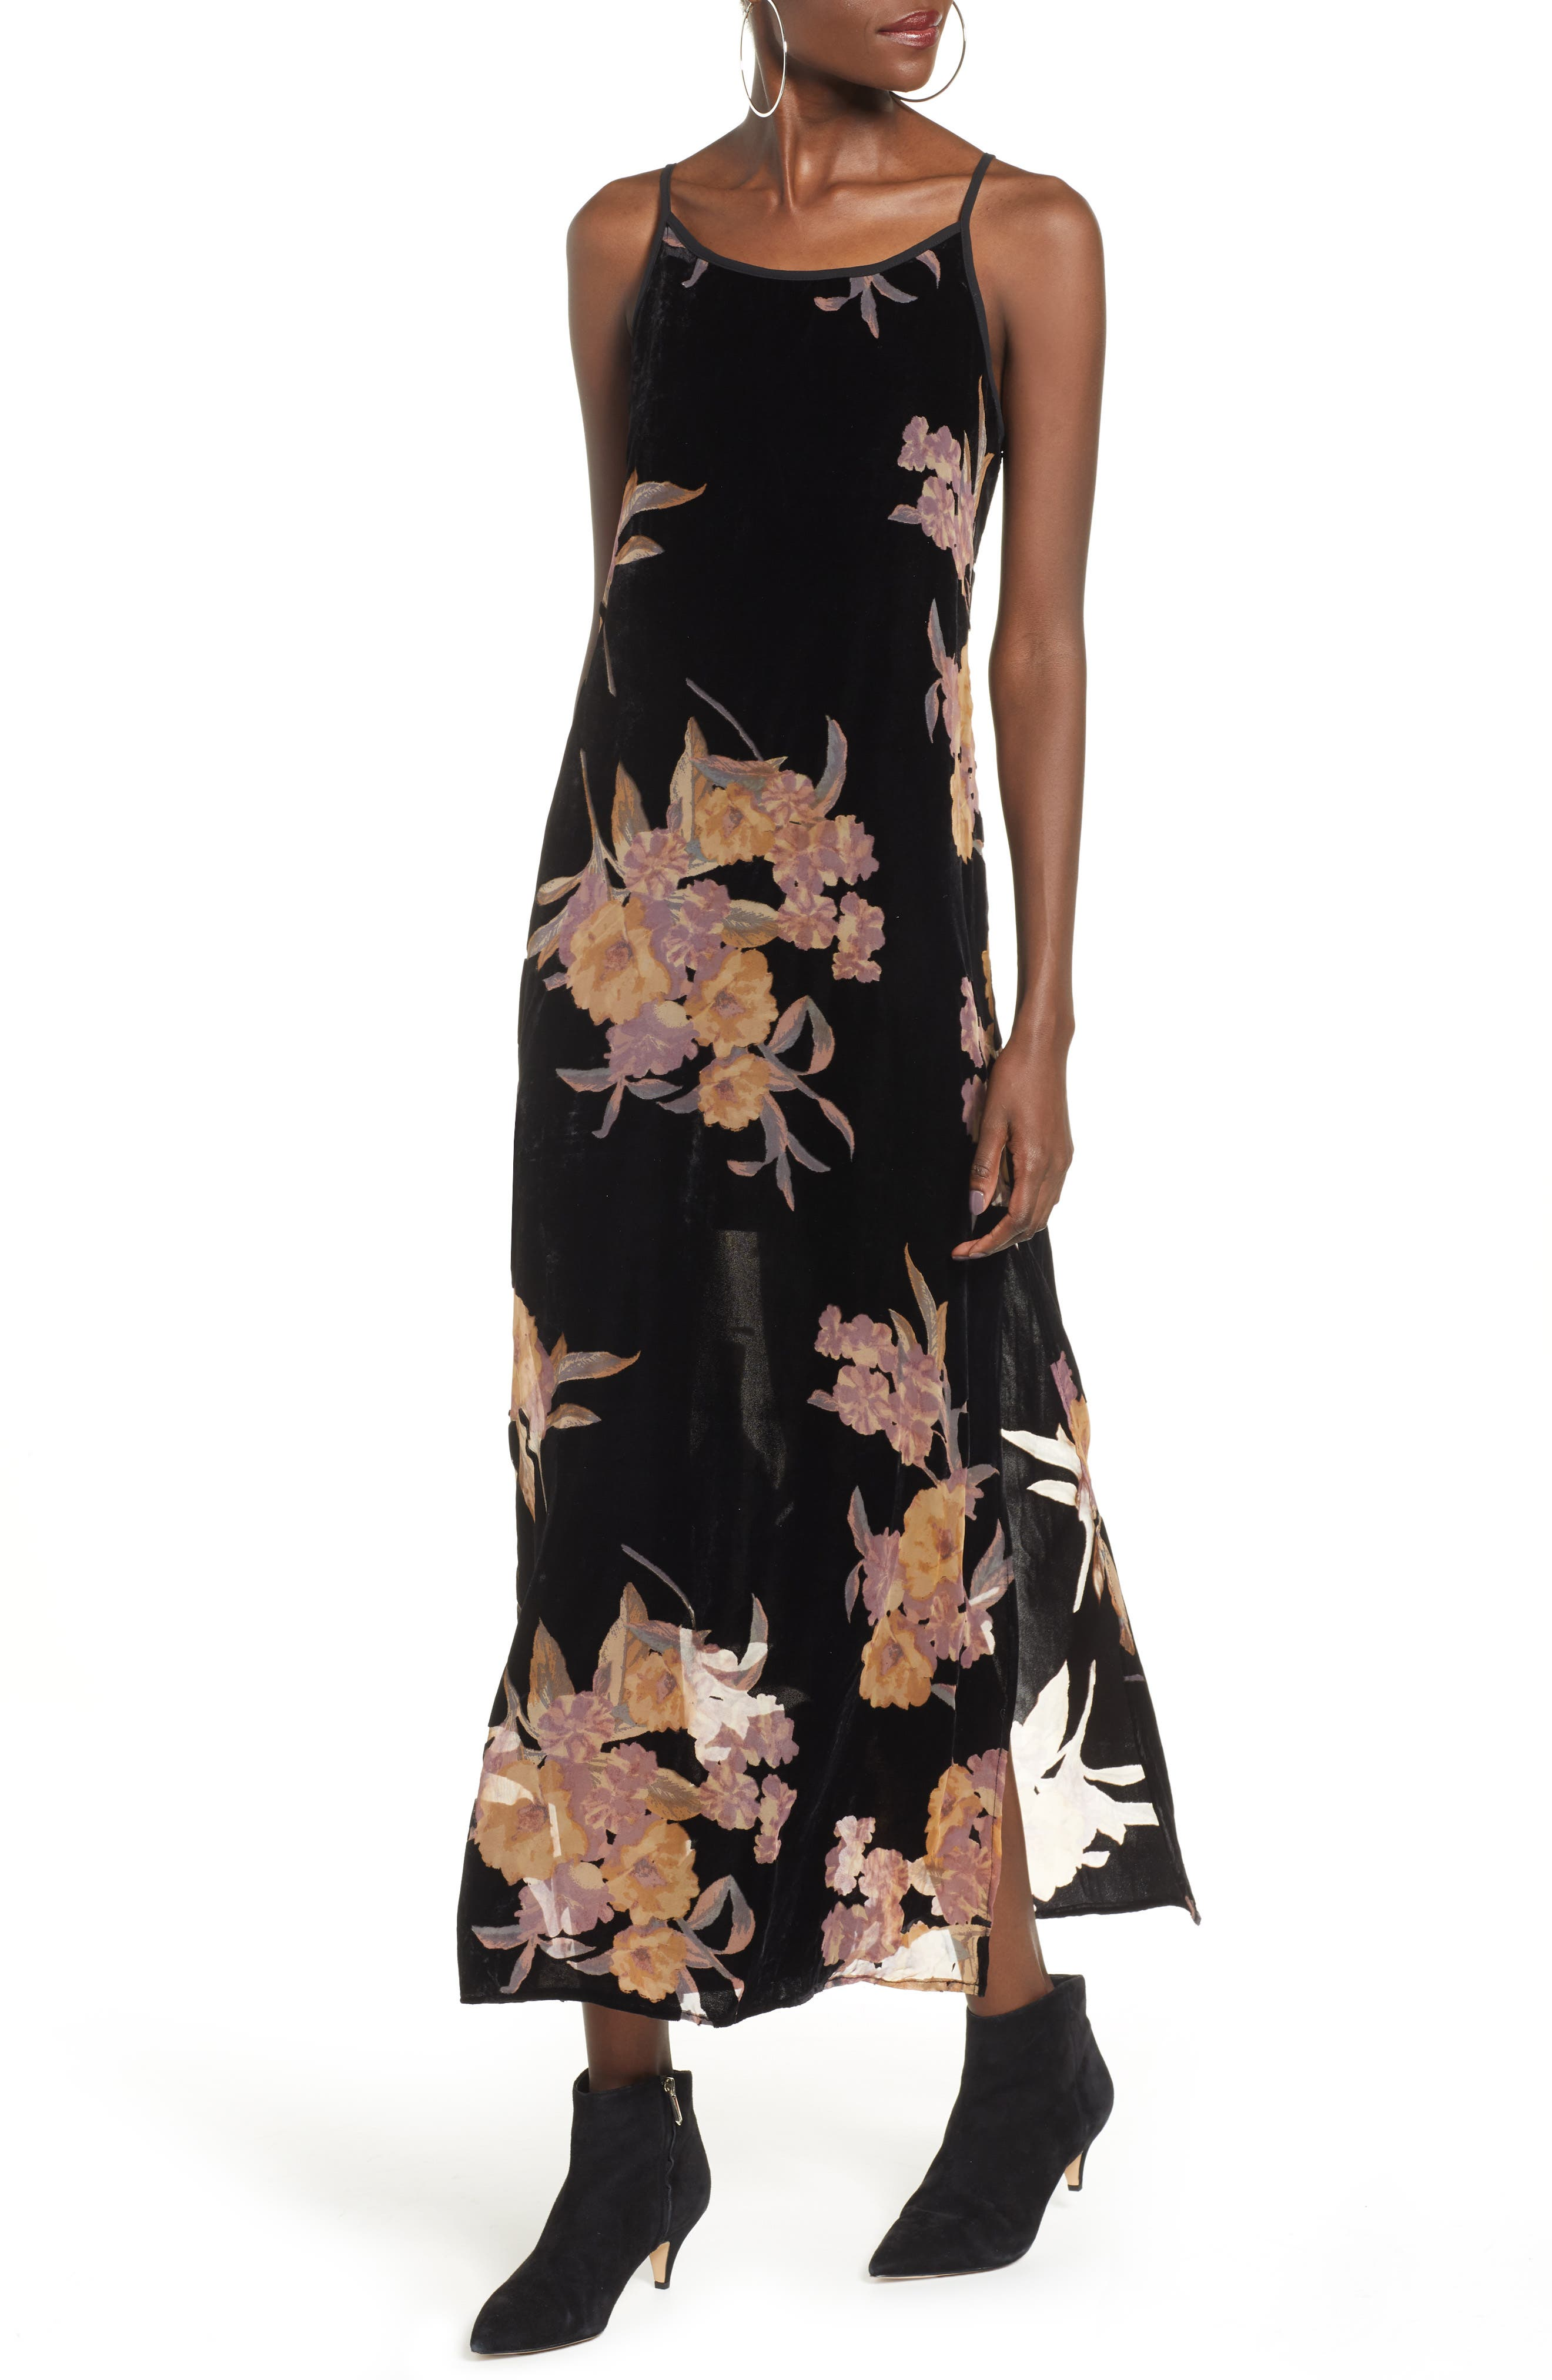 BAND OF GYPSIES Mallorey Floral Print Velvet Dress, Main, color, 001